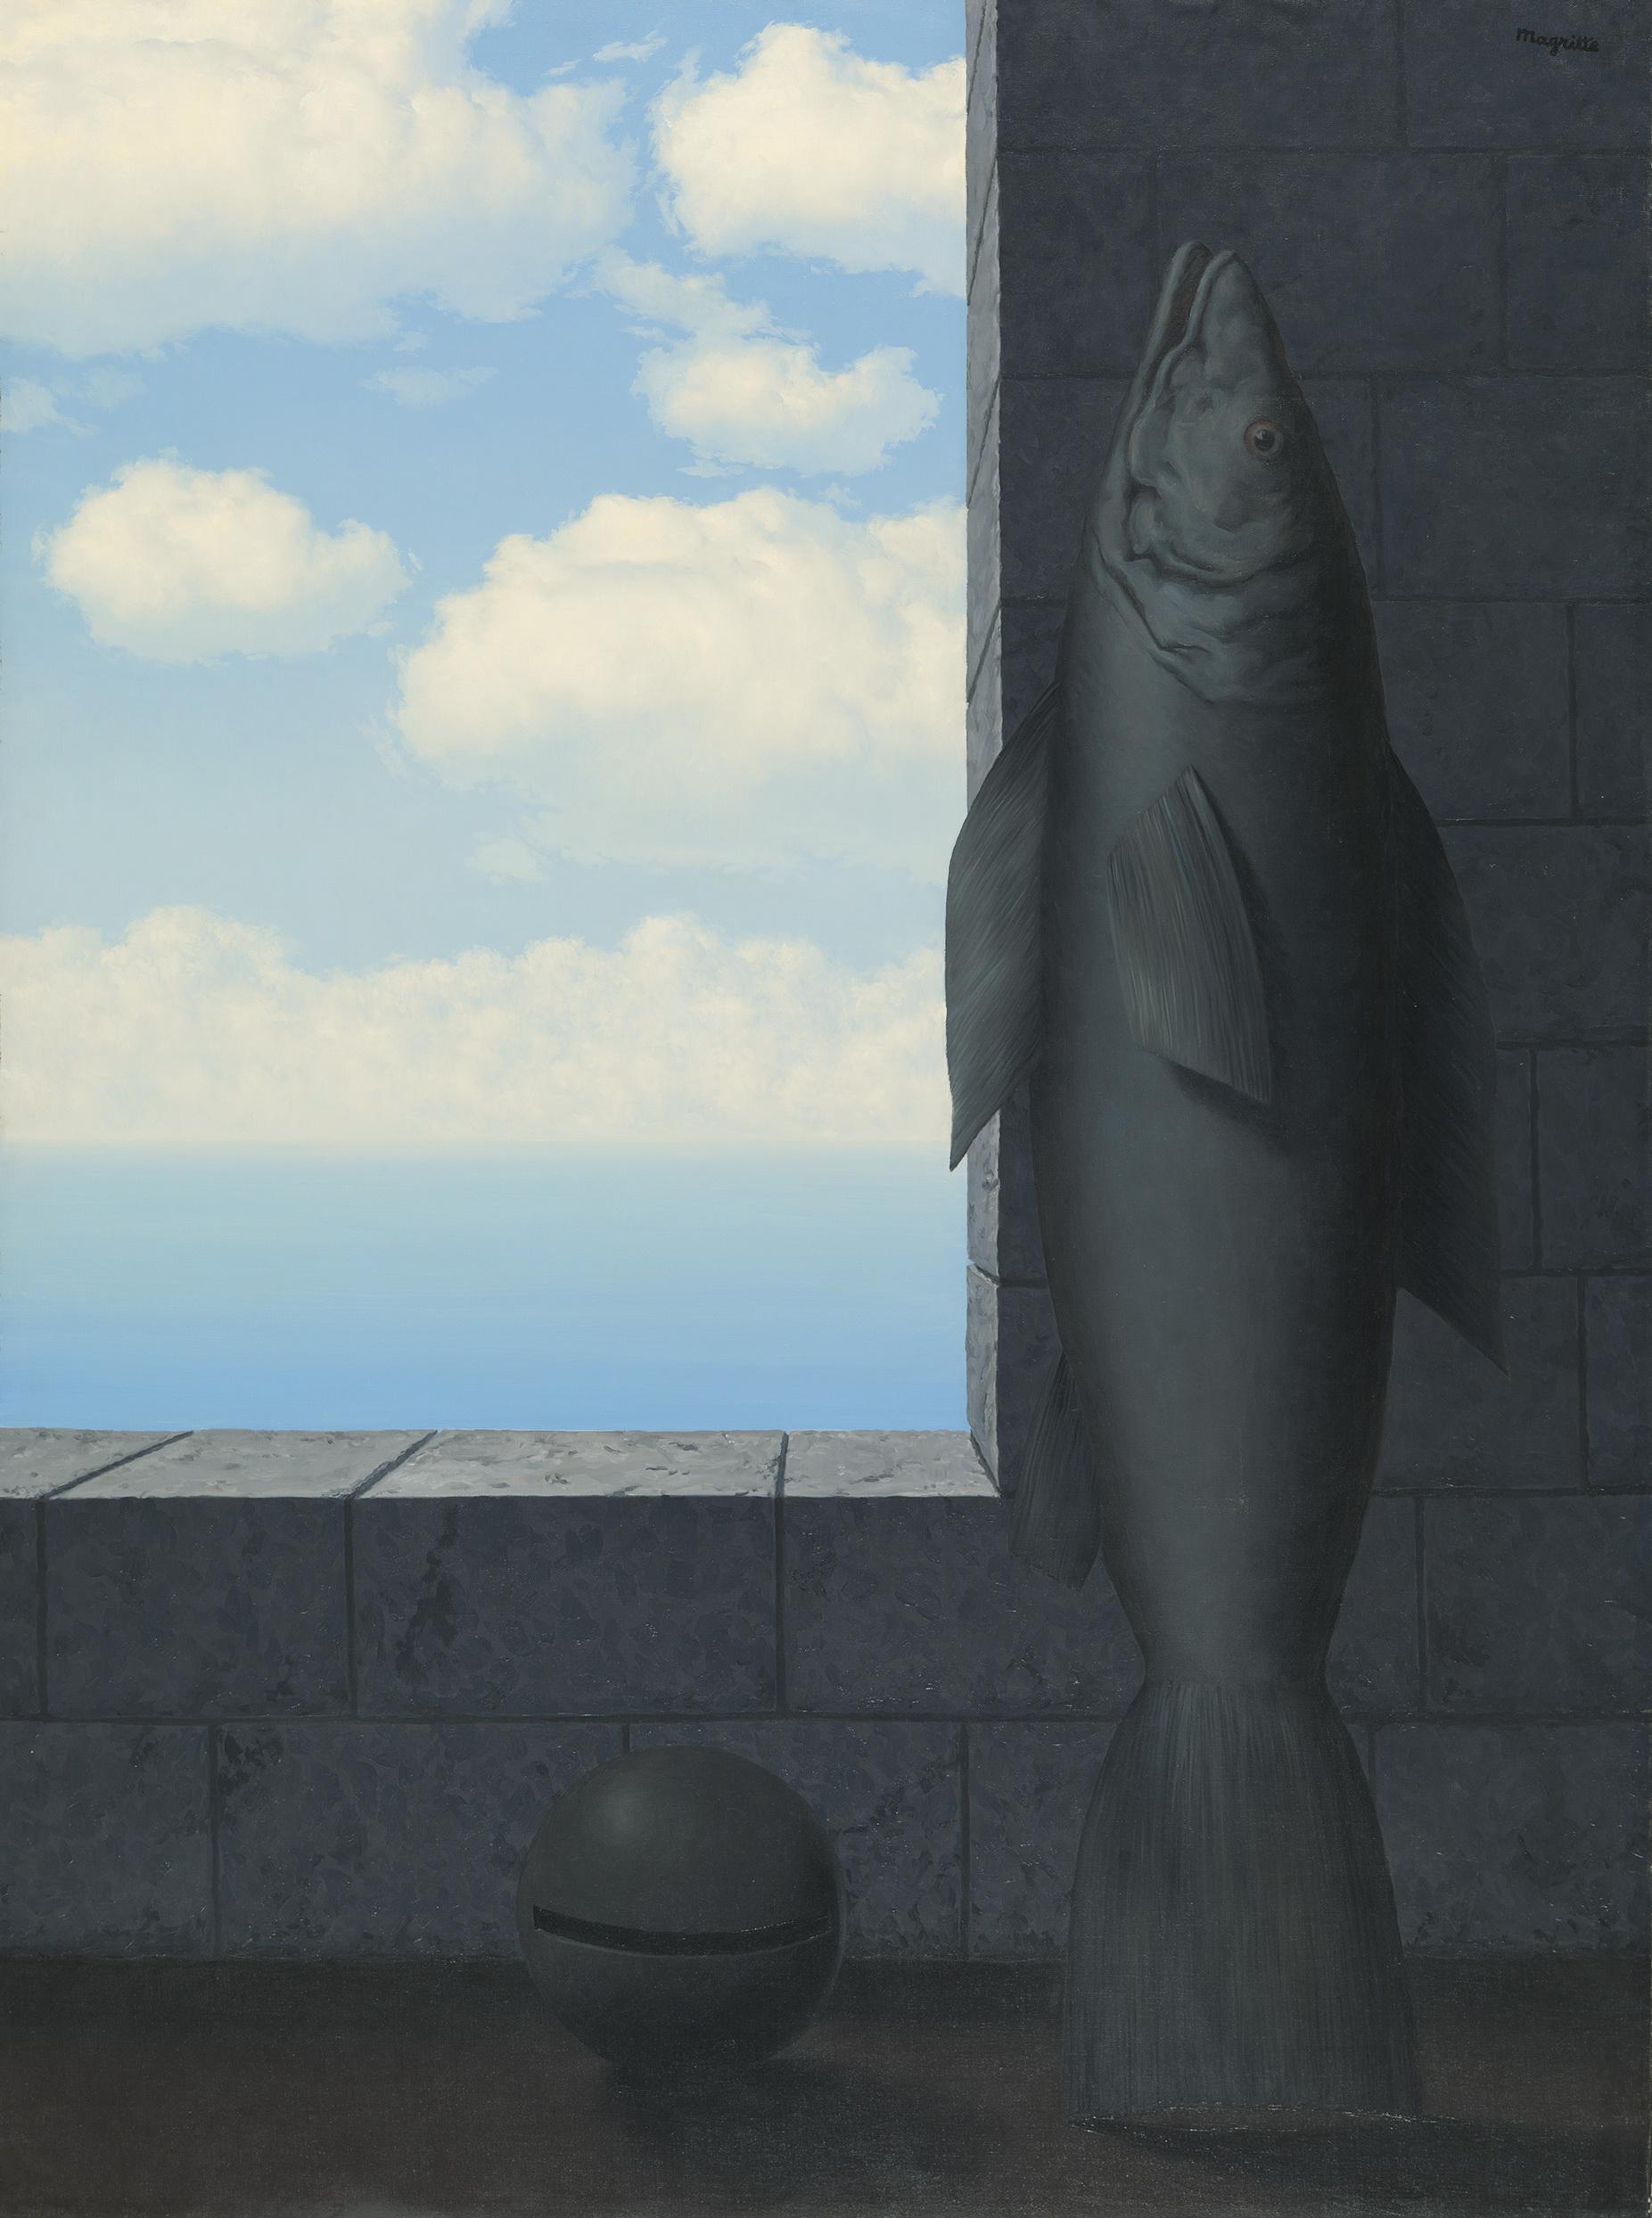 essay regarding rene magritte